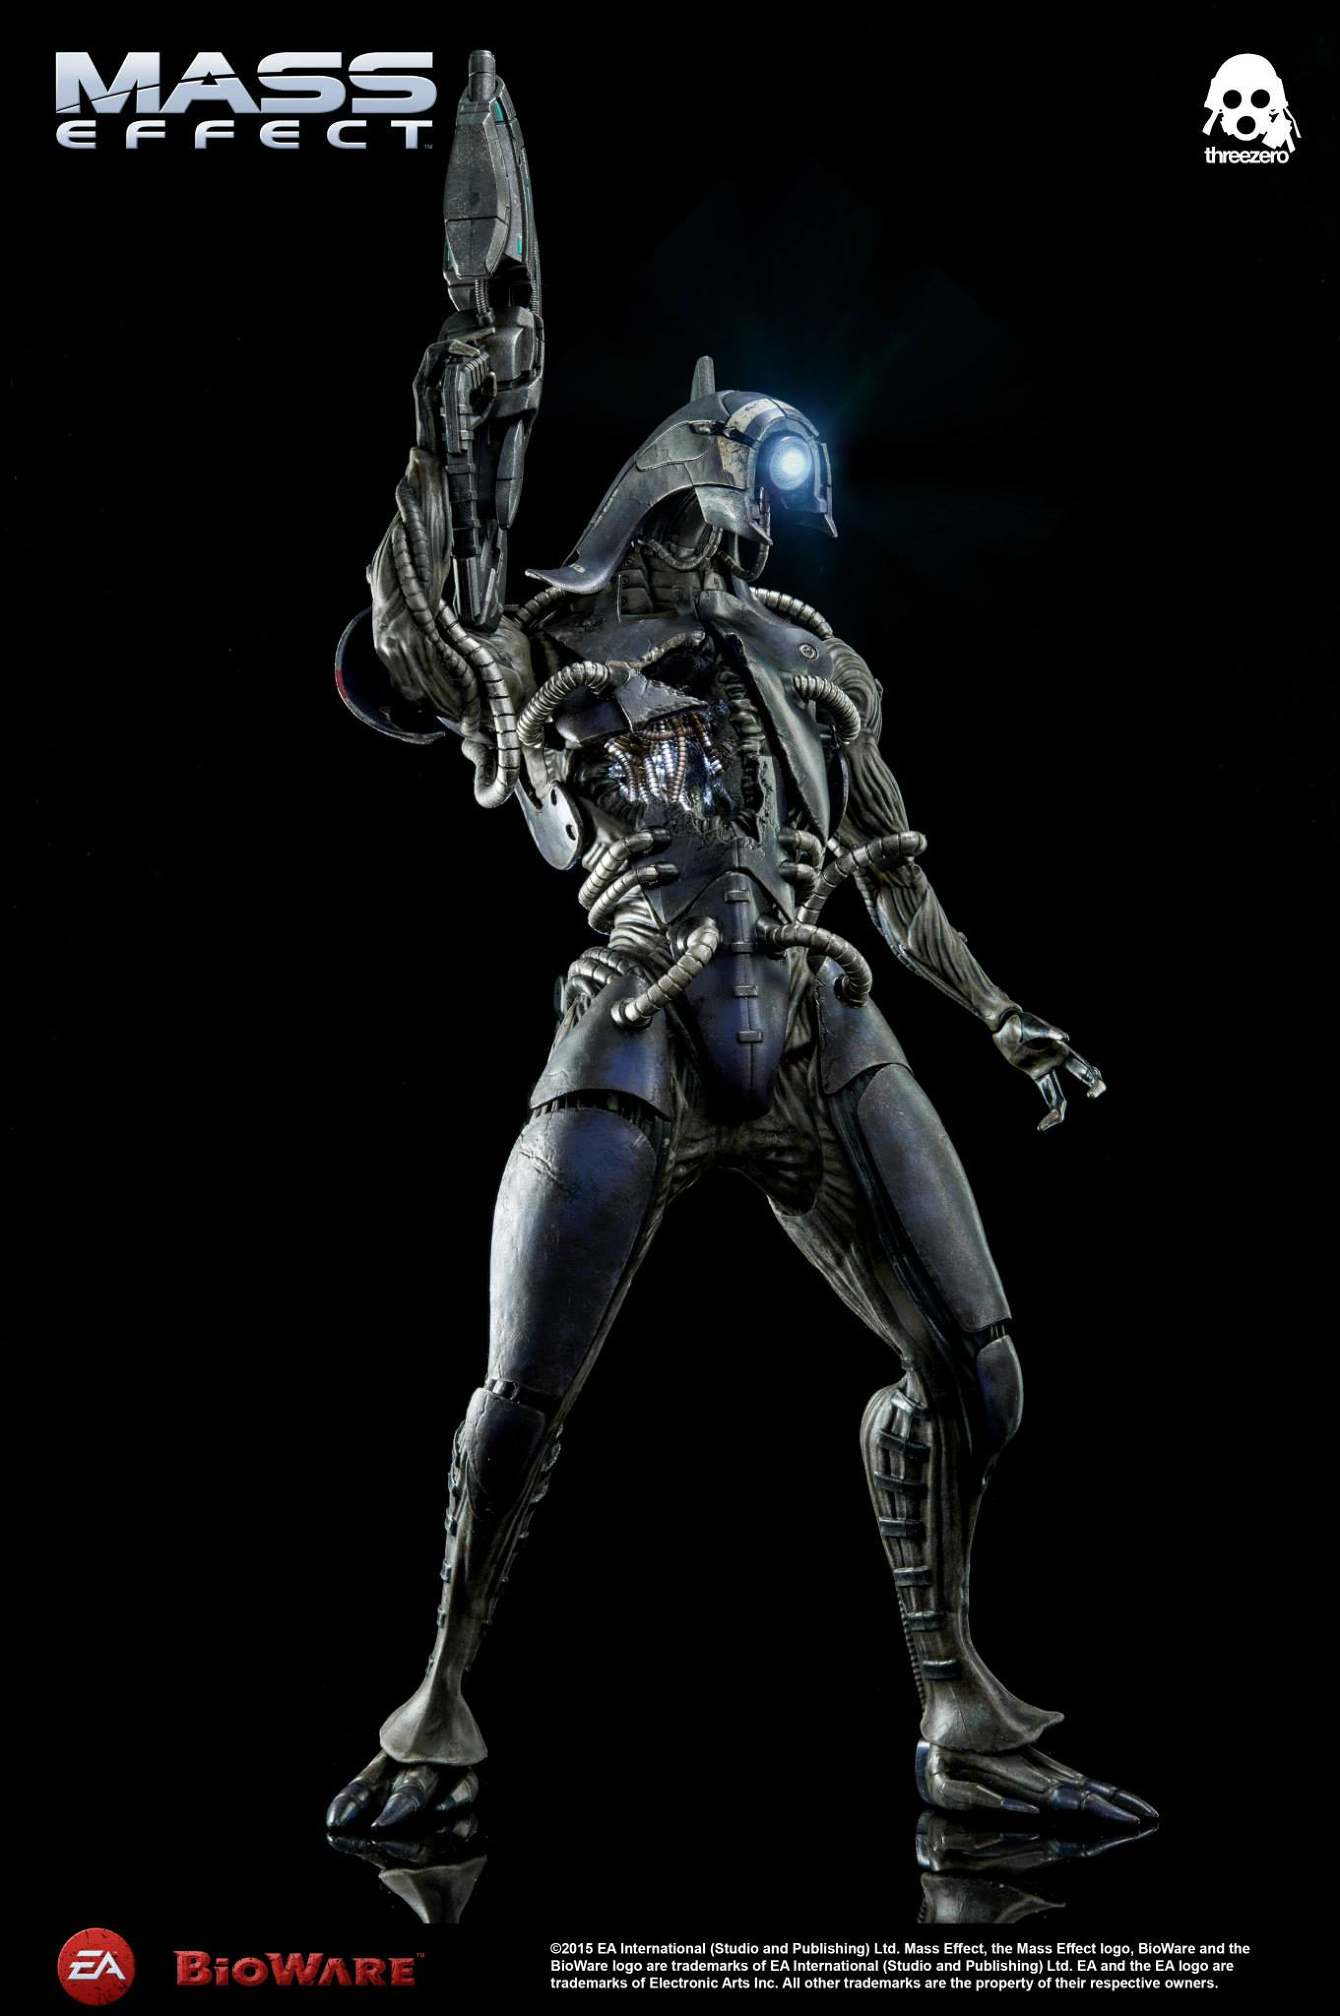 ThreeZero-Bioware-video-game-Legion-Mass-Effect-figure-7_1340_c.jpg